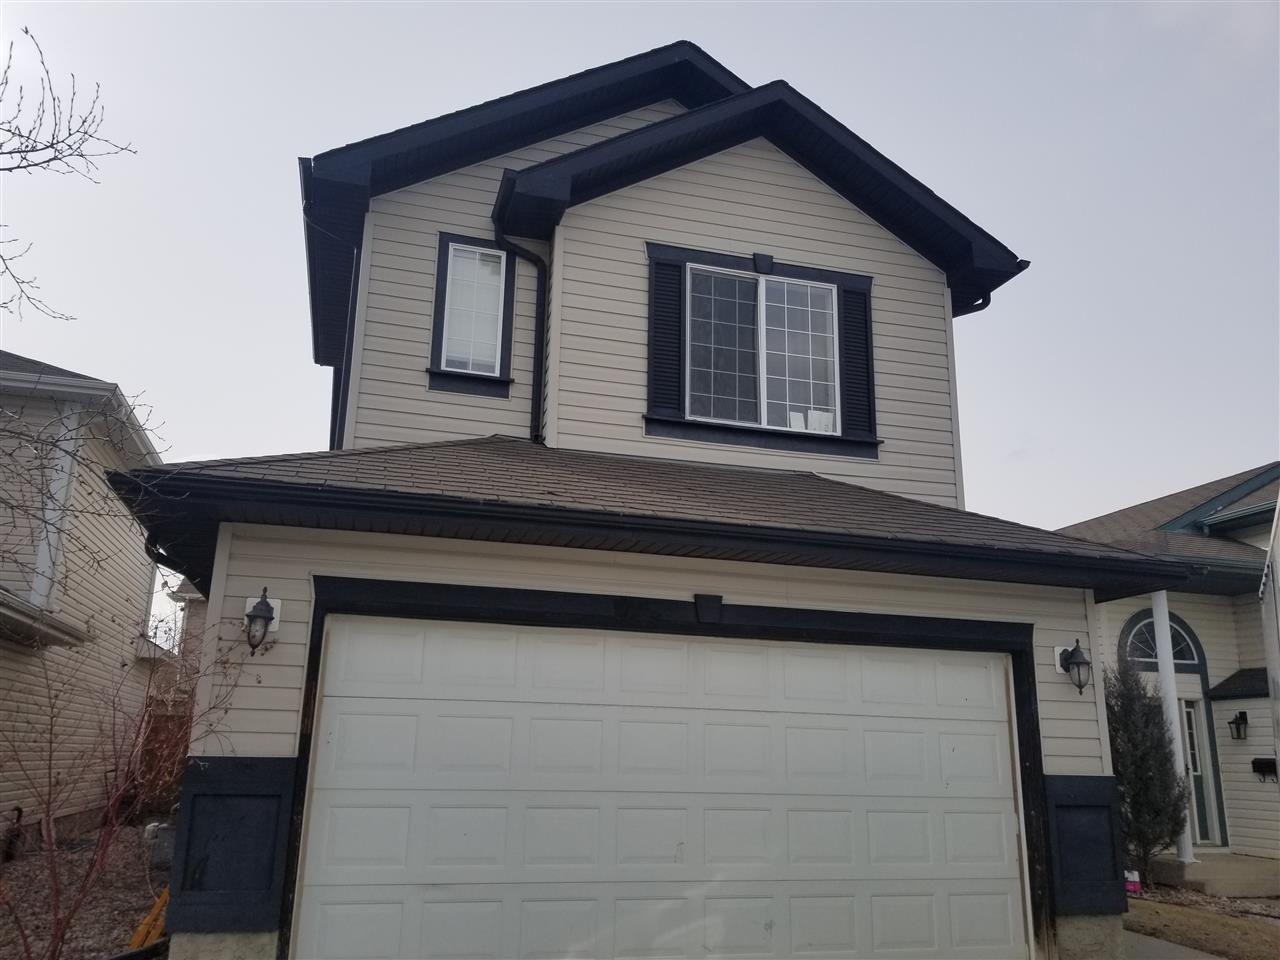 Main Photo: 16112 90 Street in Edmonton: Zone 28 House for sale : MLS®# E4235528